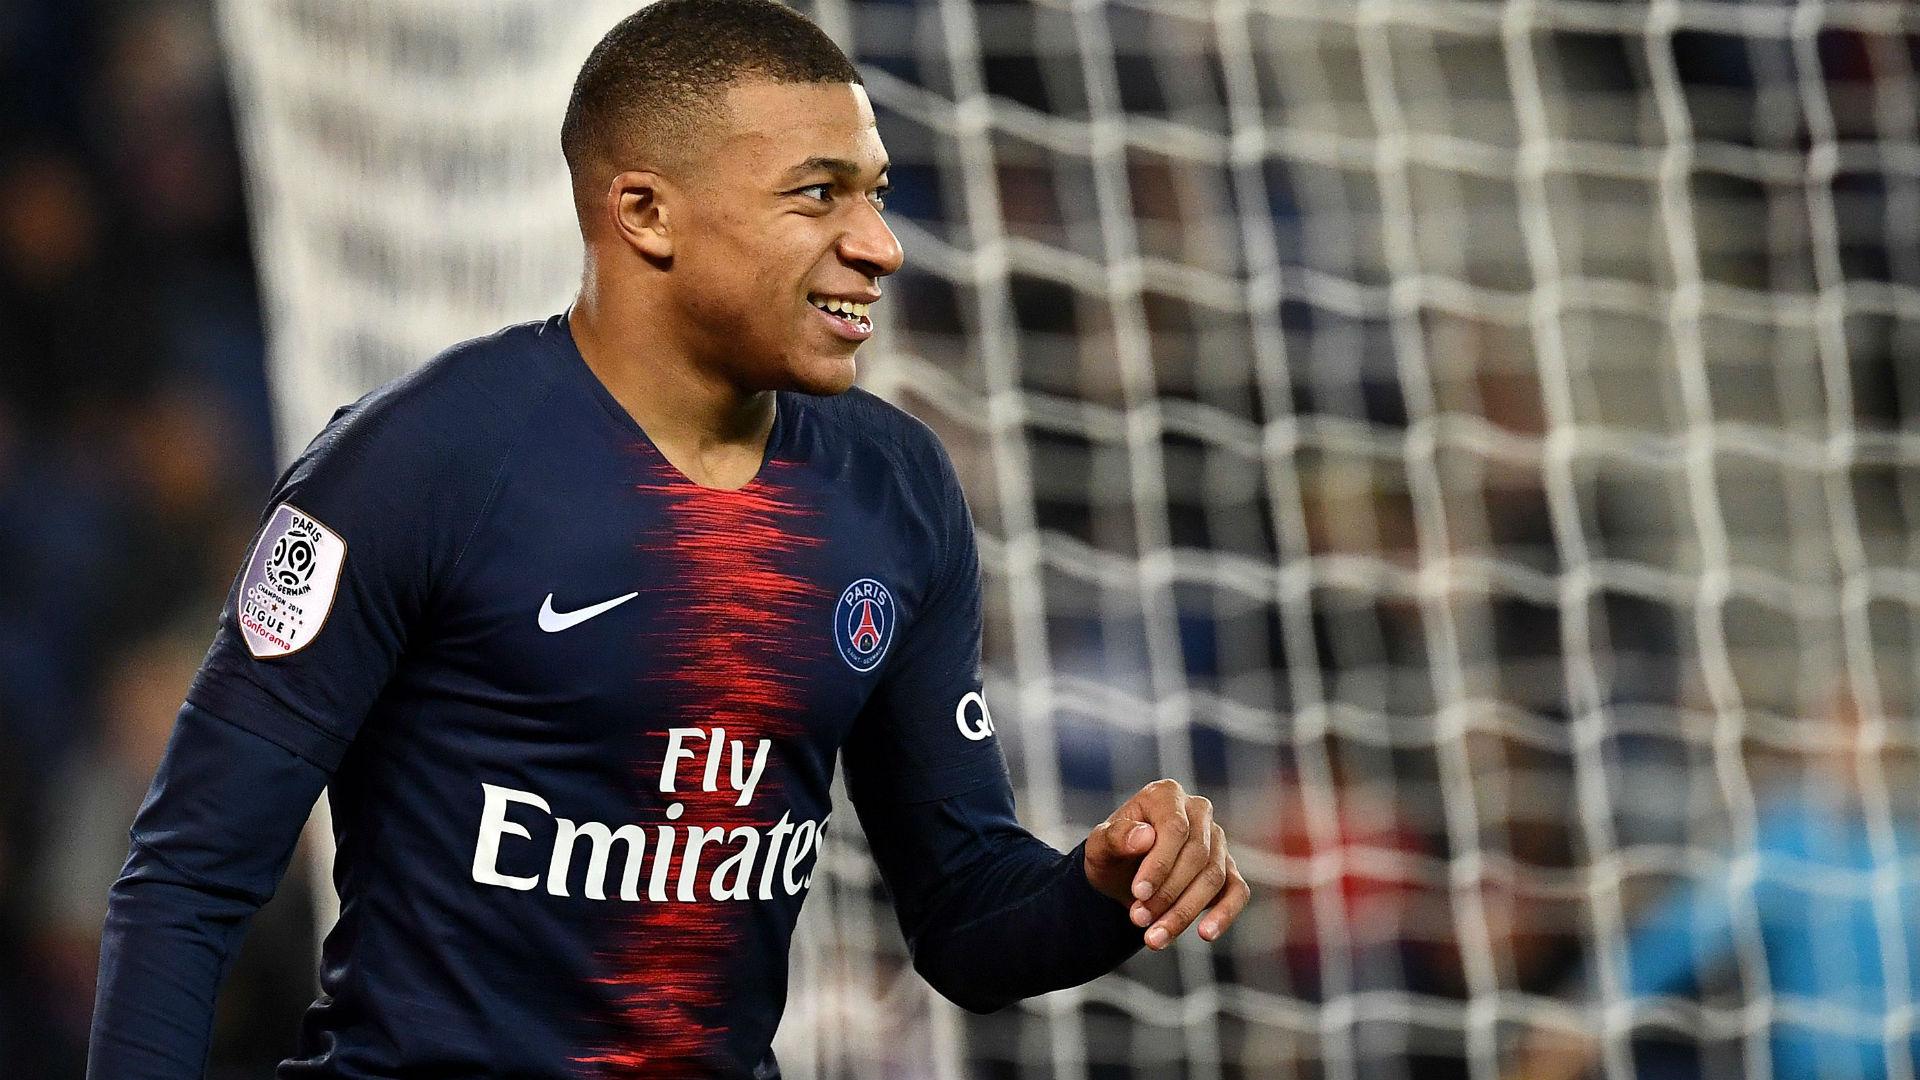 Paris St-Germain: Lassana Diarra contract terminated